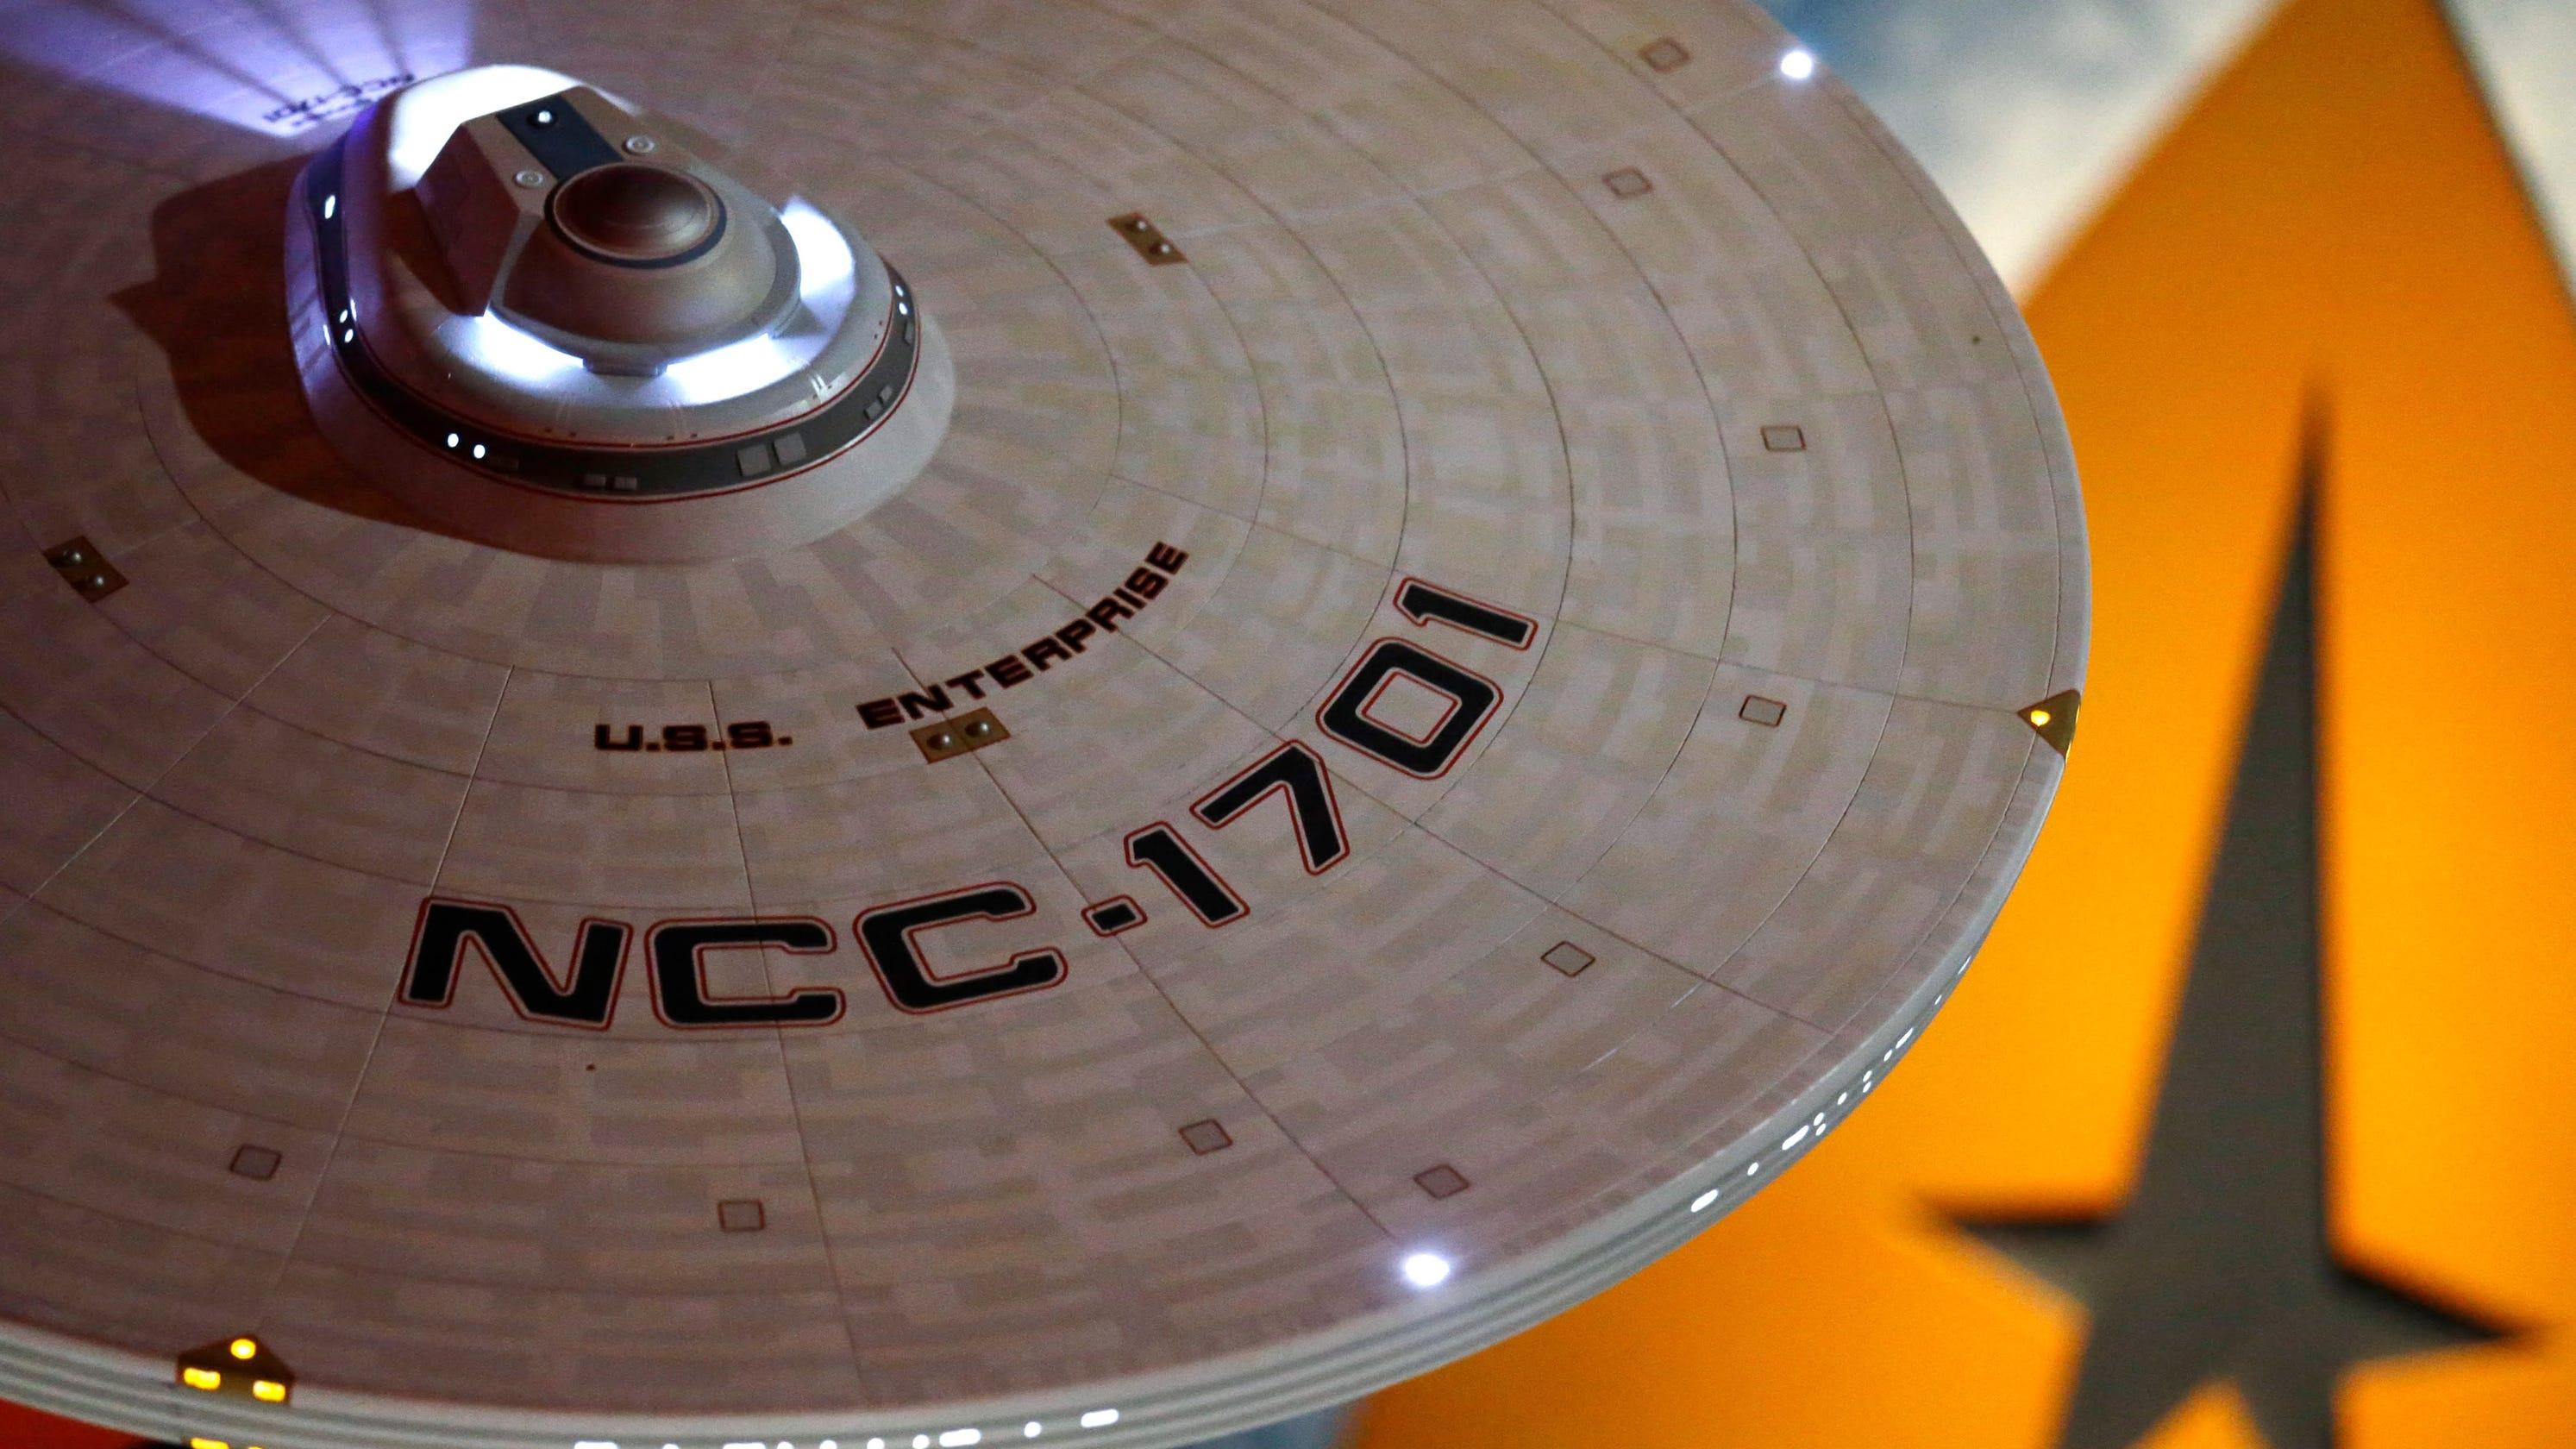 Star Trek' artifacts headed to Children's Museum of Indianapolis